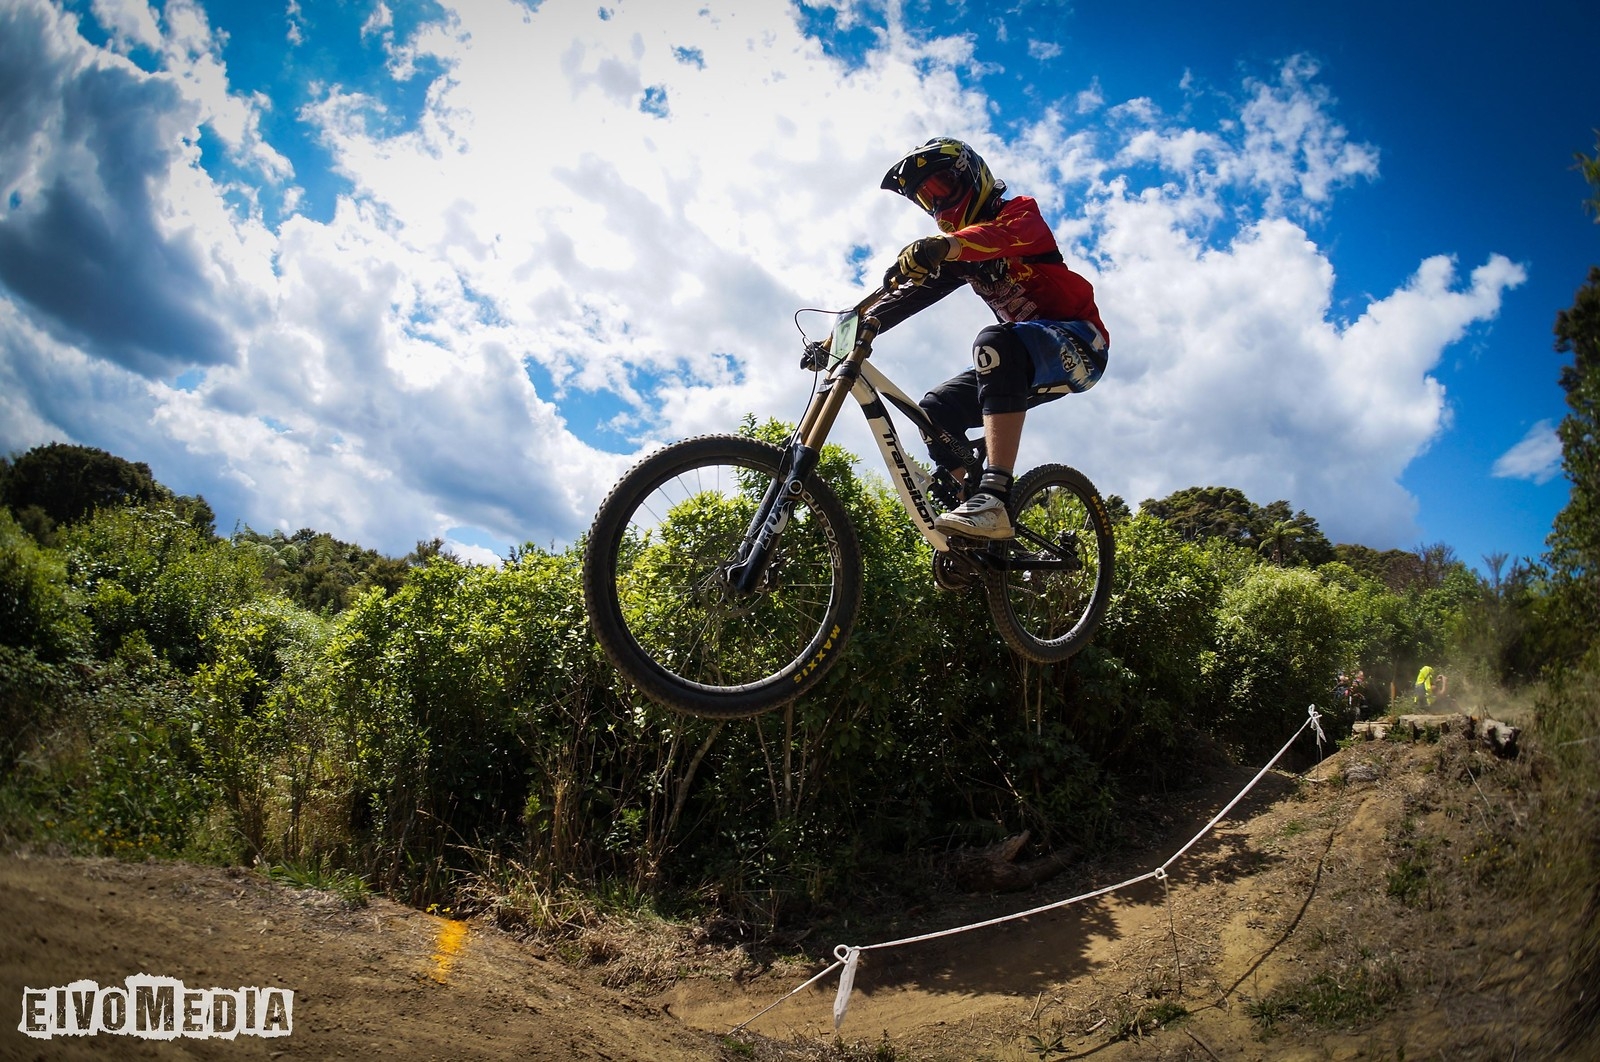 Hunua DH-4 - EIVOMEDIA - Mountain Biking Pictures - Vital MTB